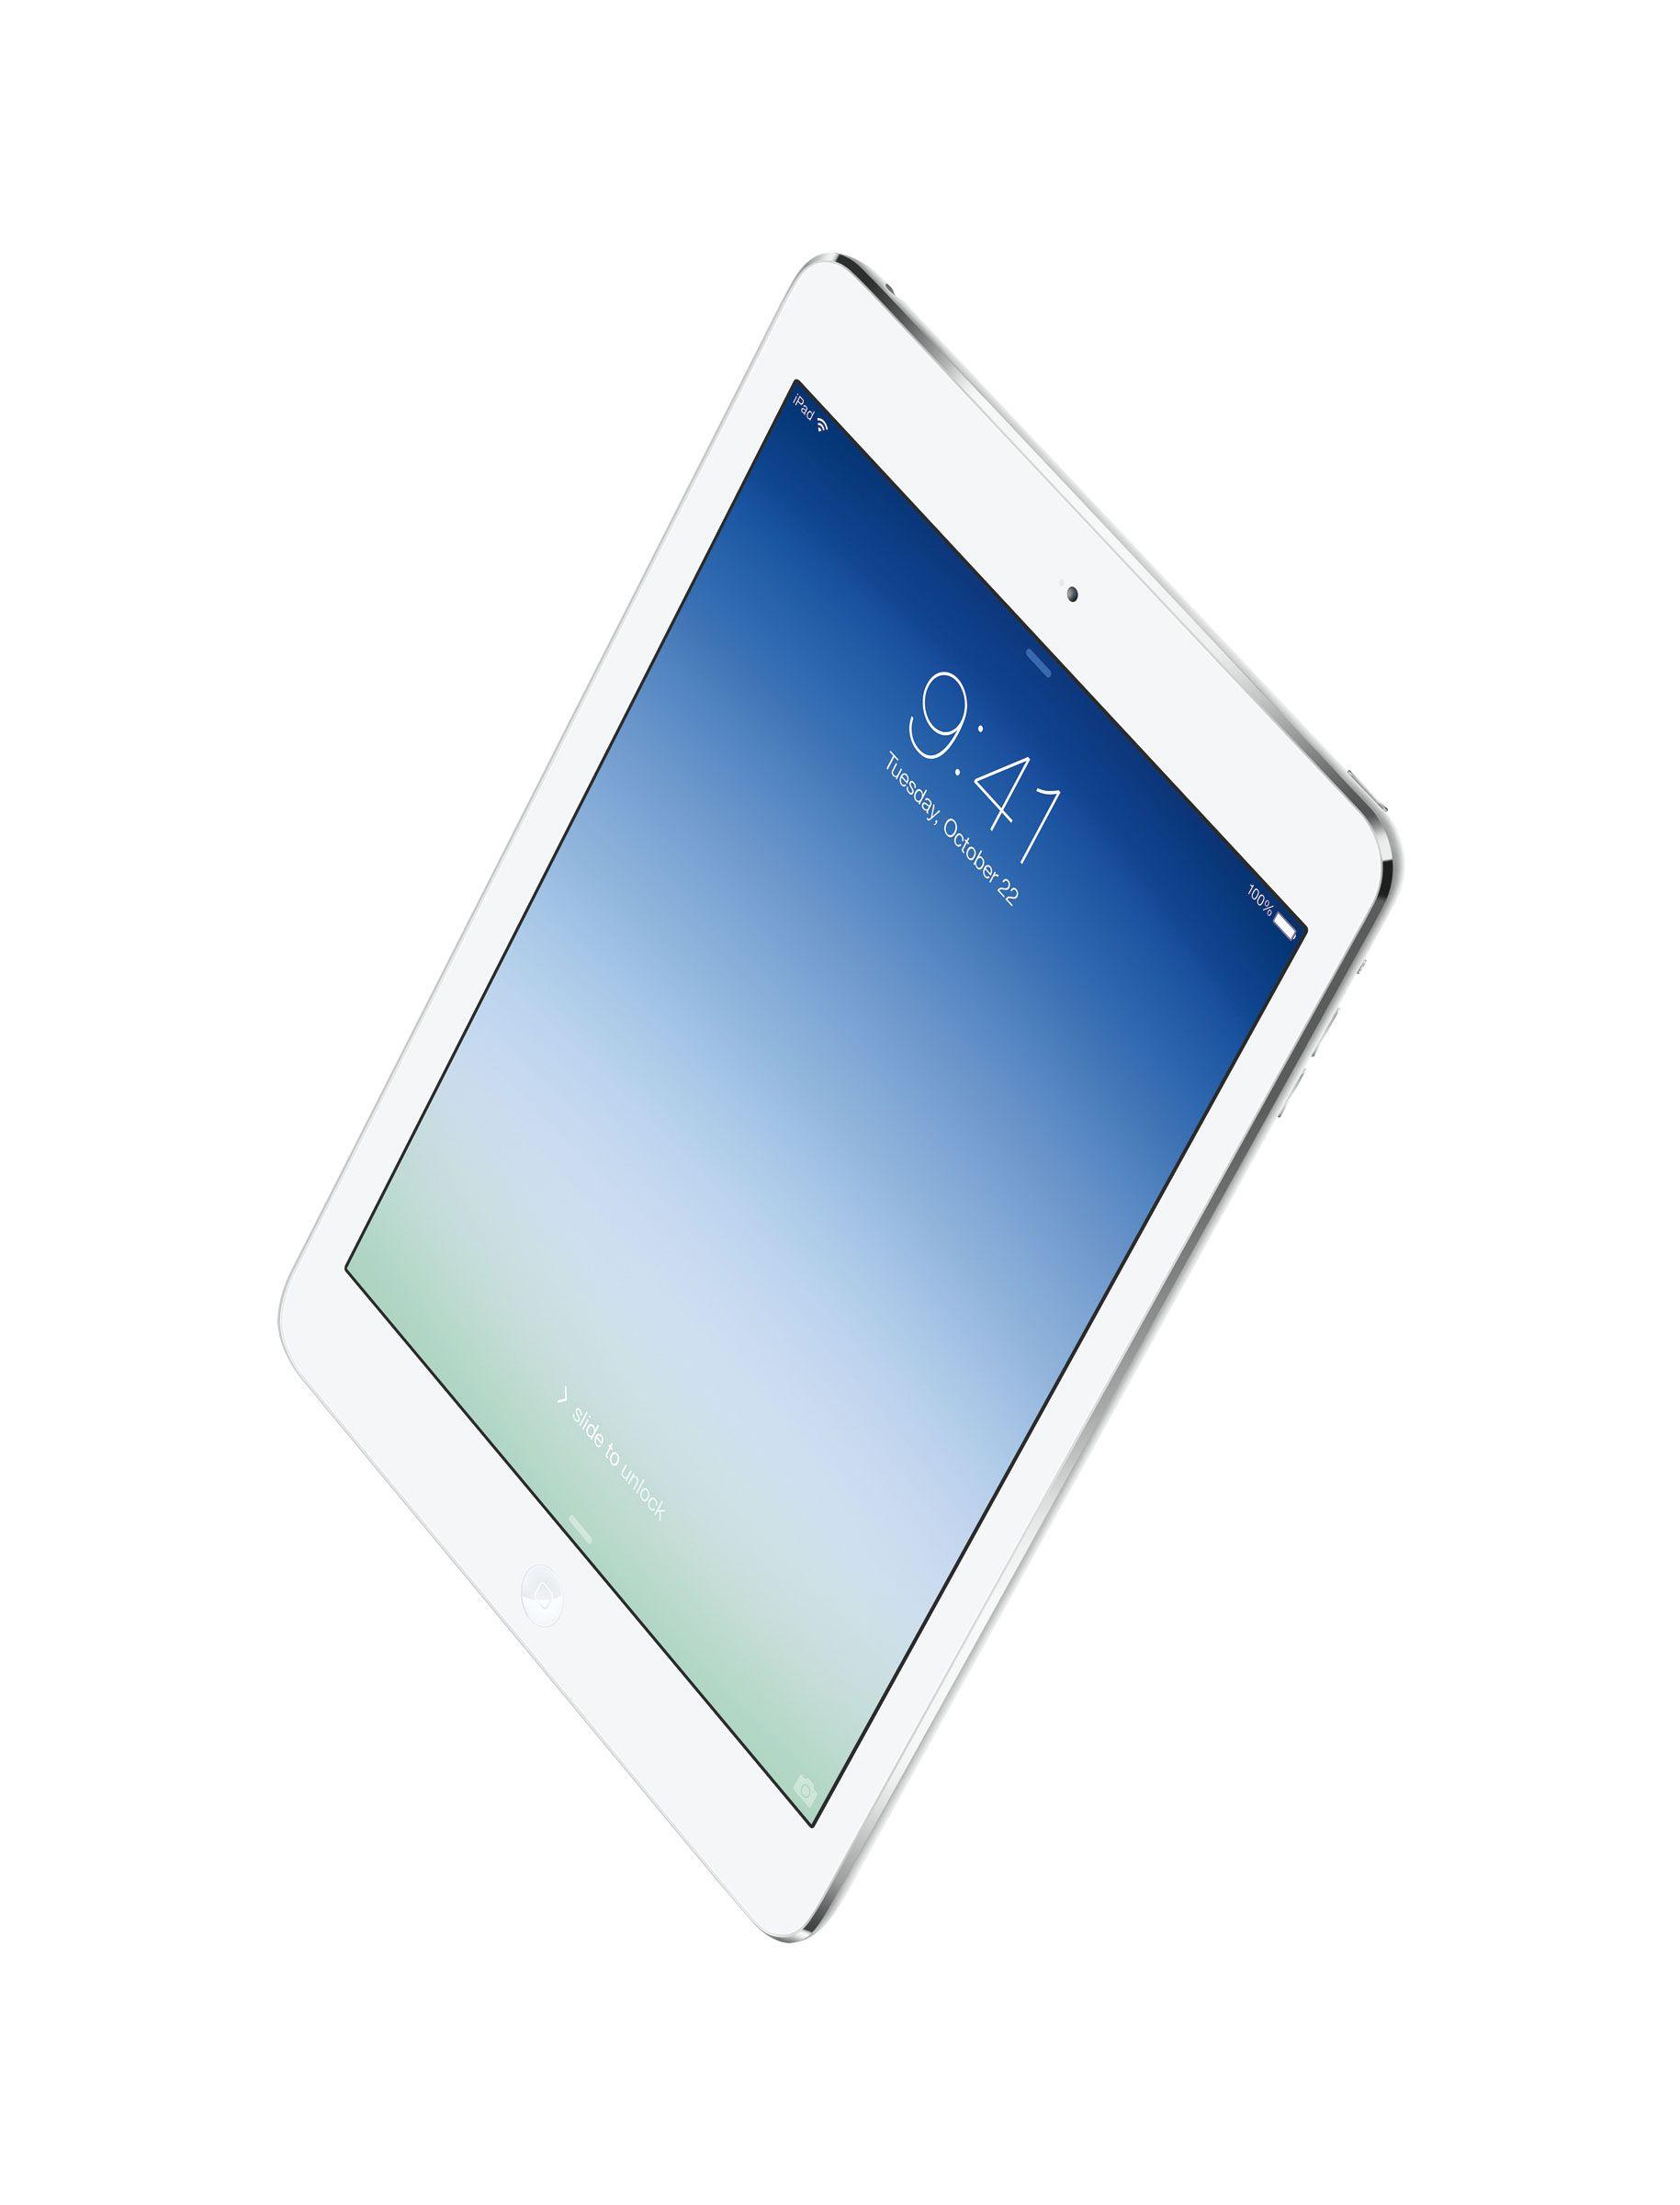 中華電信跟進,宣布 16 日正式開賣 iPad Air 與 Retina iPad mini - http://chinese.vr-zone.com/94208/cht-annouced-ipad-air-and-ipad-mini-with-retina-display-bundle-price-12122013/